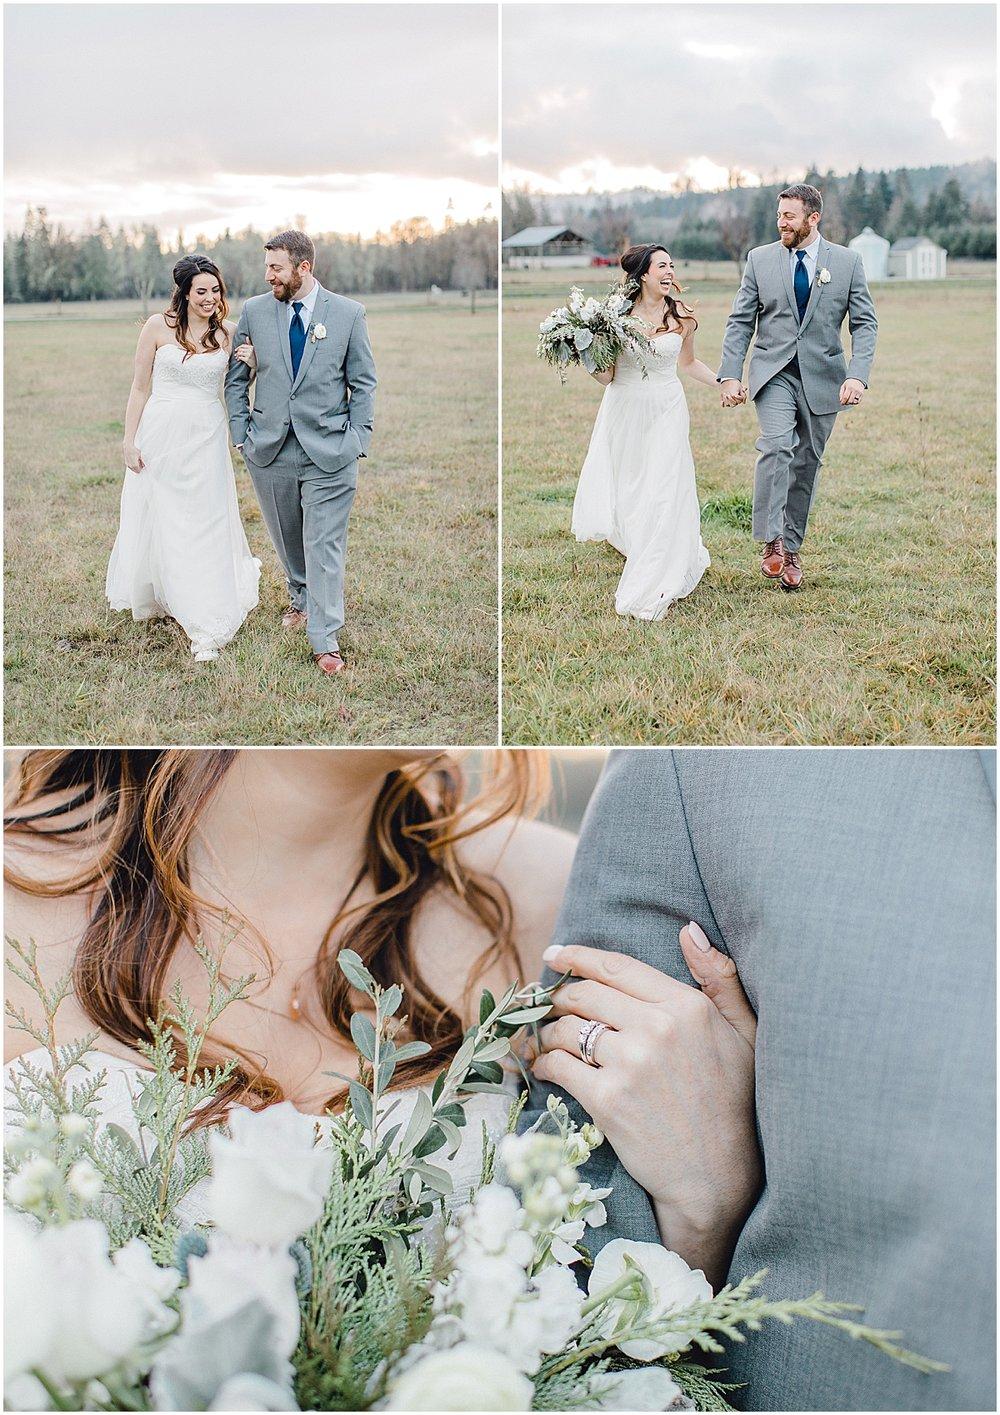 Chehalis Washington Winter Wedding Silver and White | Willapa Hills Farm Wedding | Eastham | Emma Rose Company PNW Light and Airy Wedding Photographer_0086.jpg